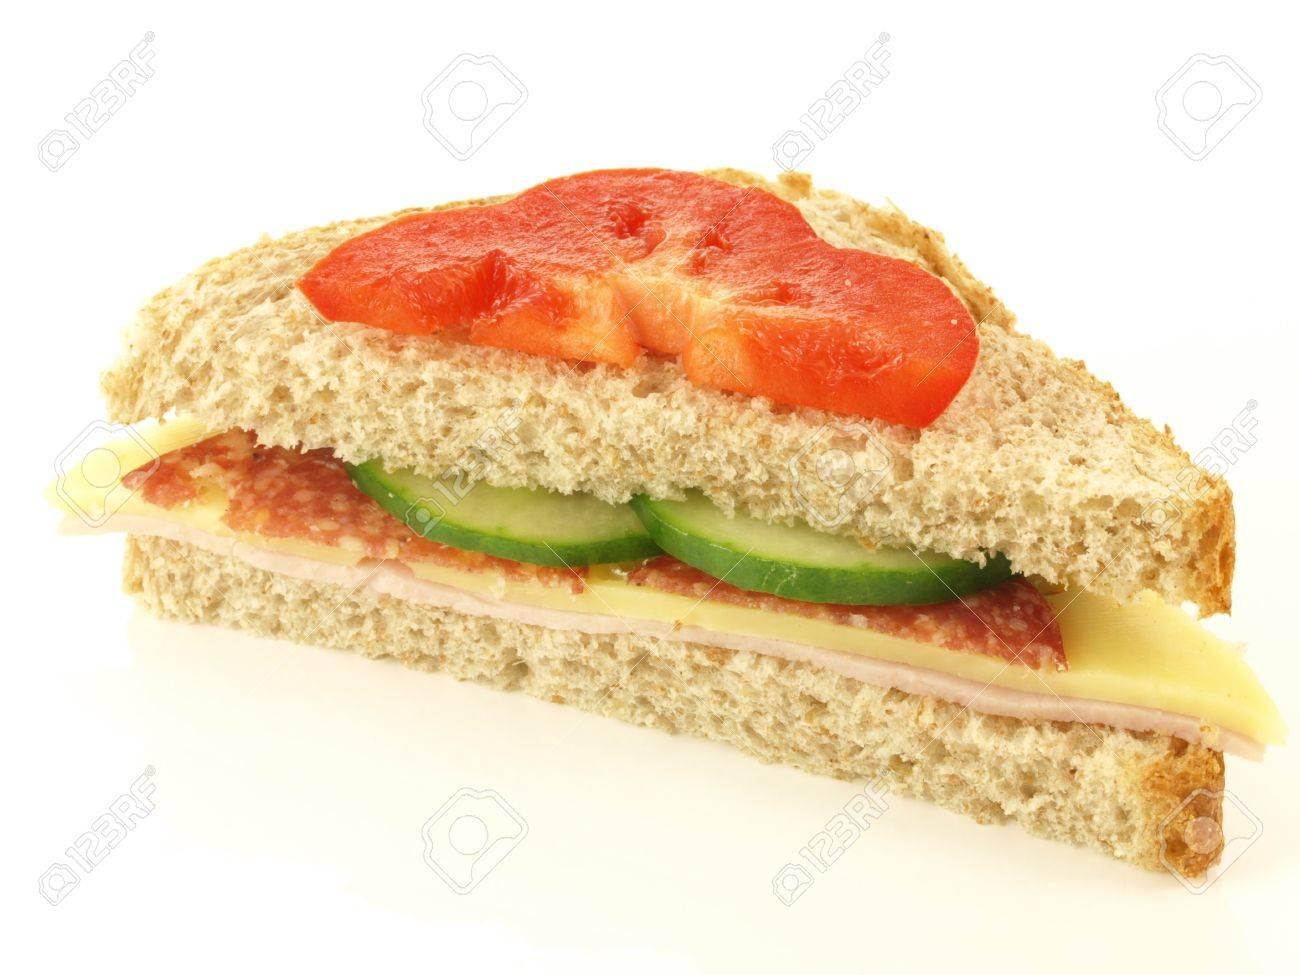 Half of tasty sandwich on white background Stock Photo - 13542459